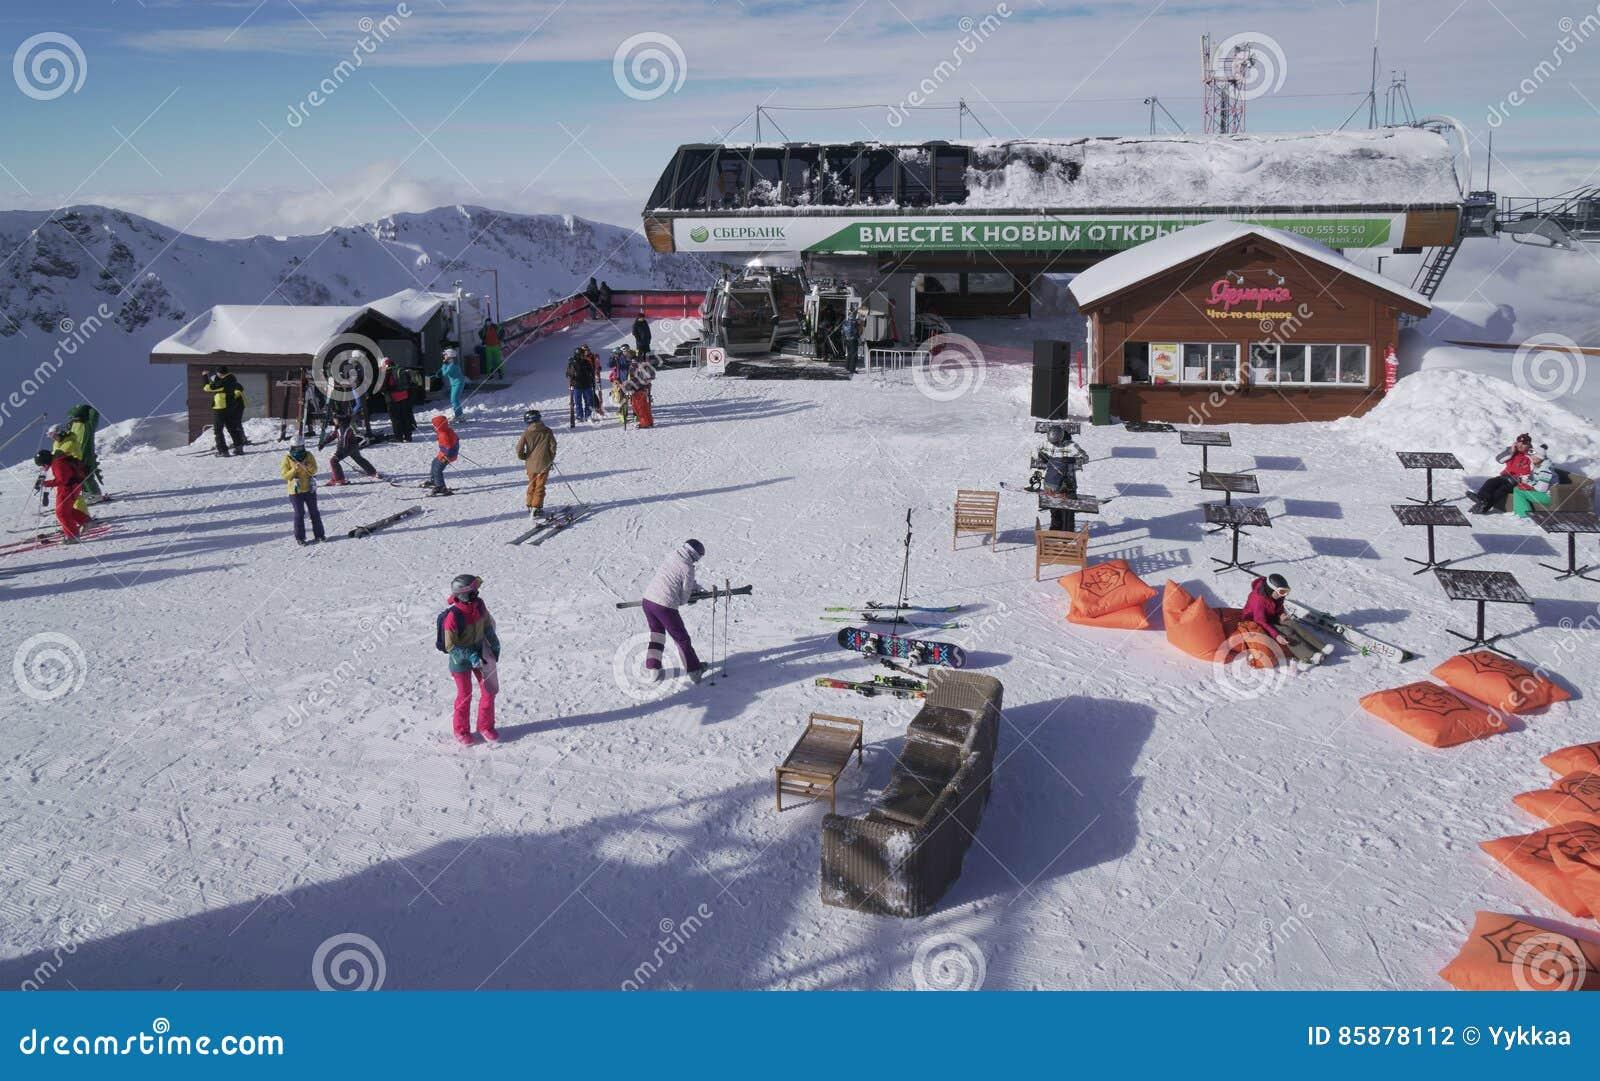 on the top of ski resort gorky gorod 2200 meters above sea level